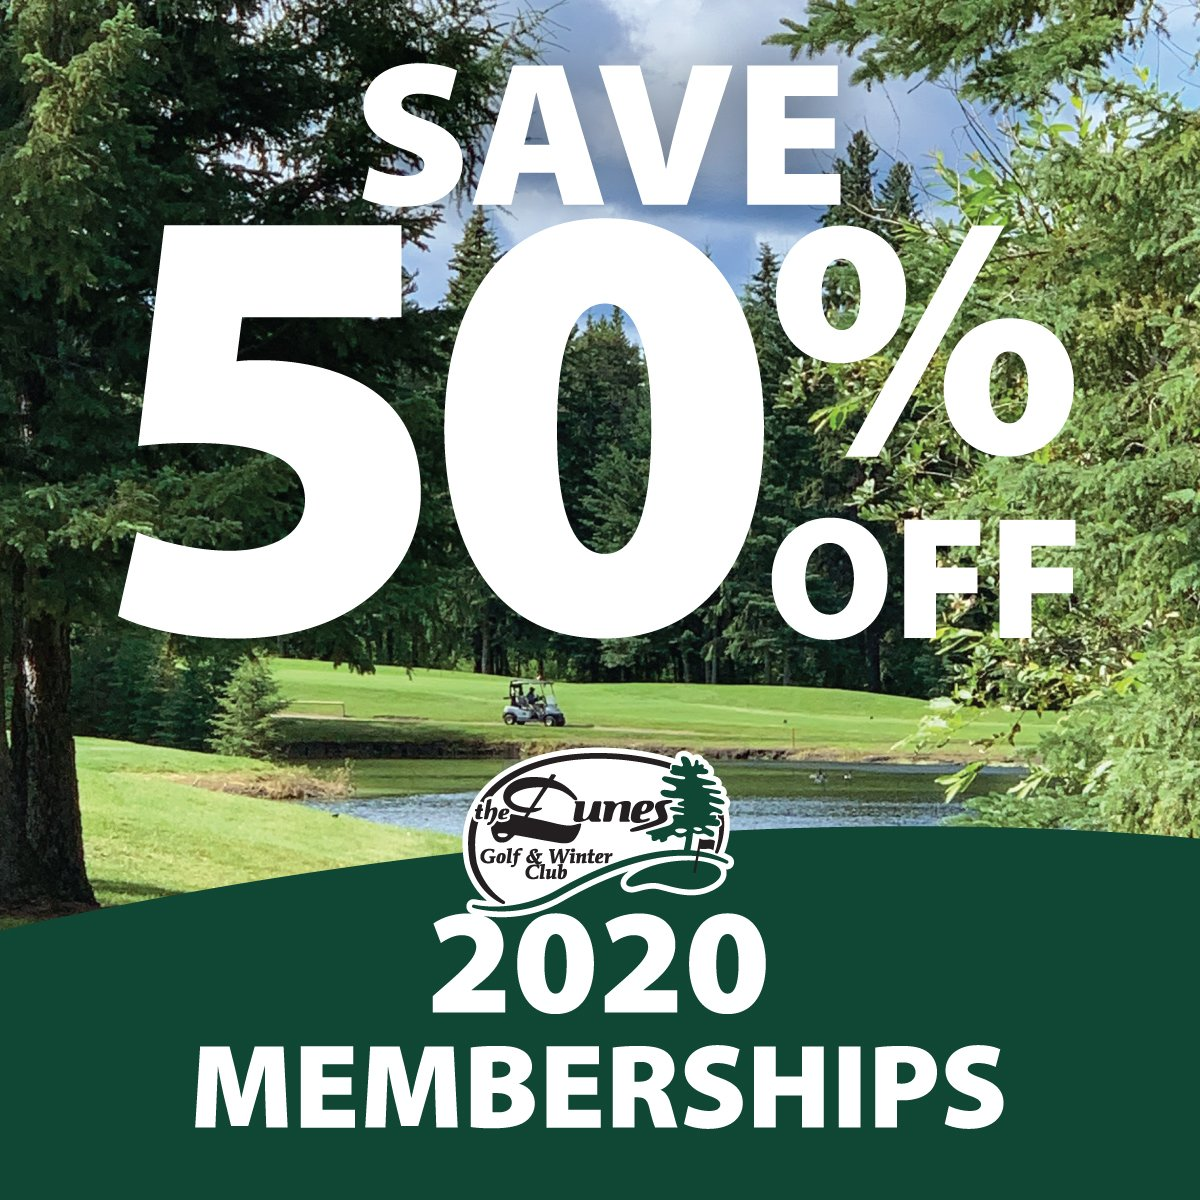 Save 50% off a 2020 Membership